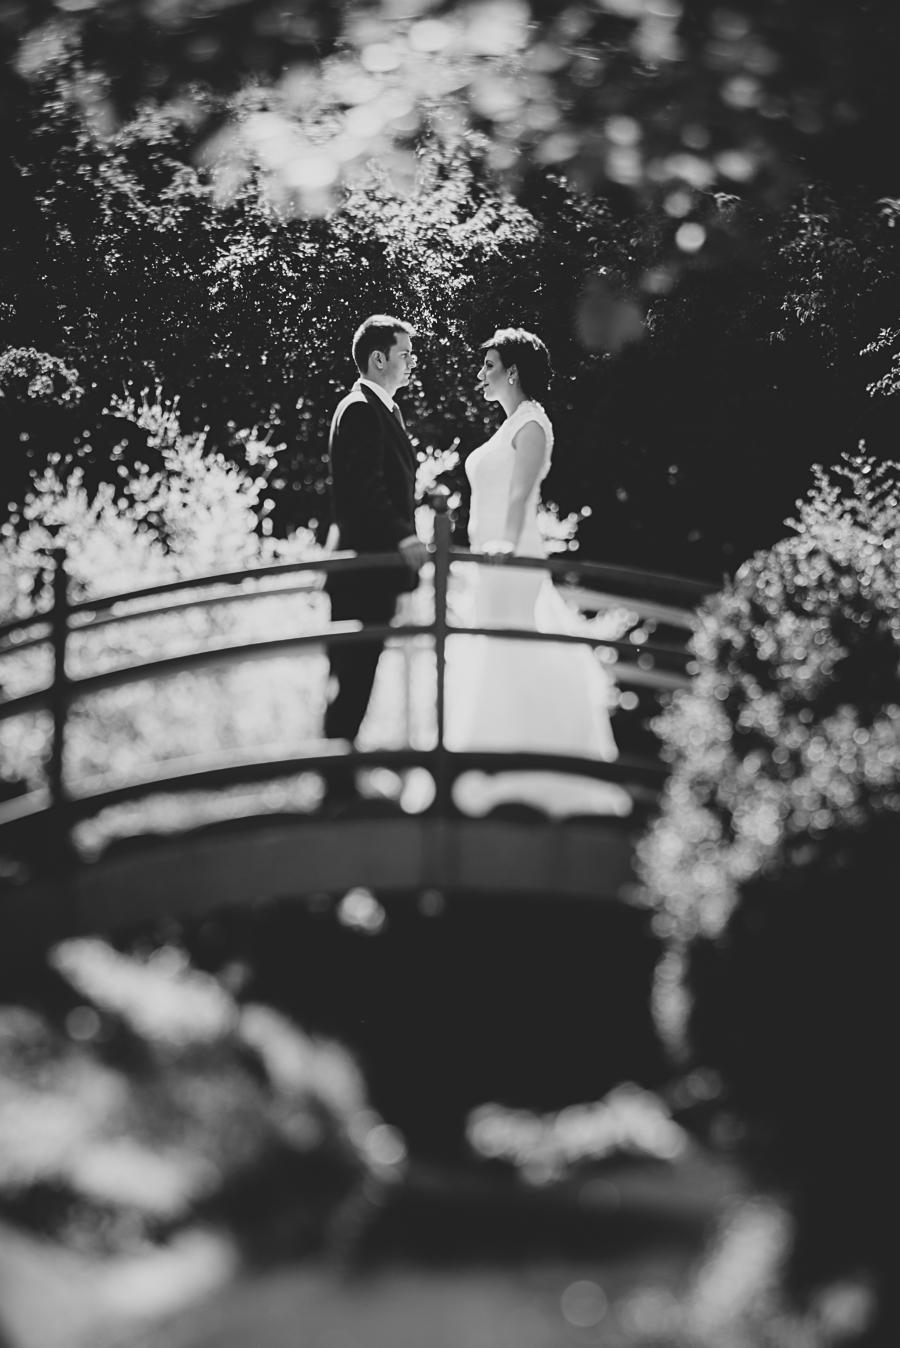 Ana-Maria & Razvan Blog 033